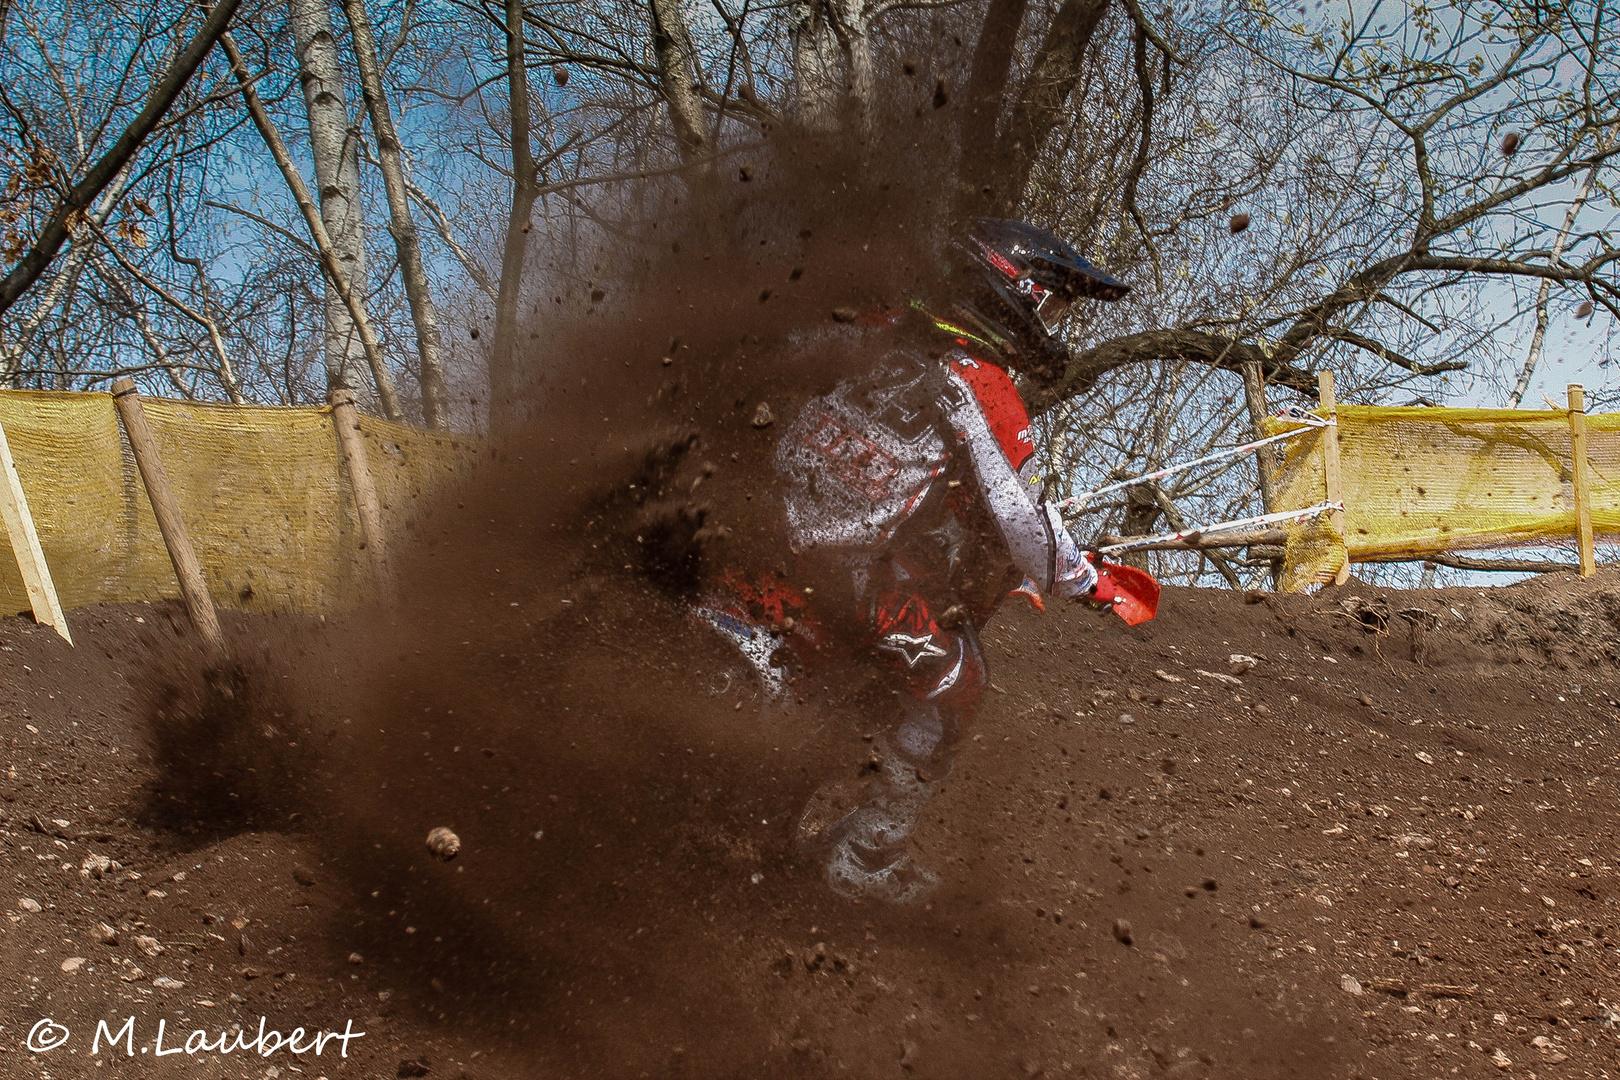 So ist Motocross